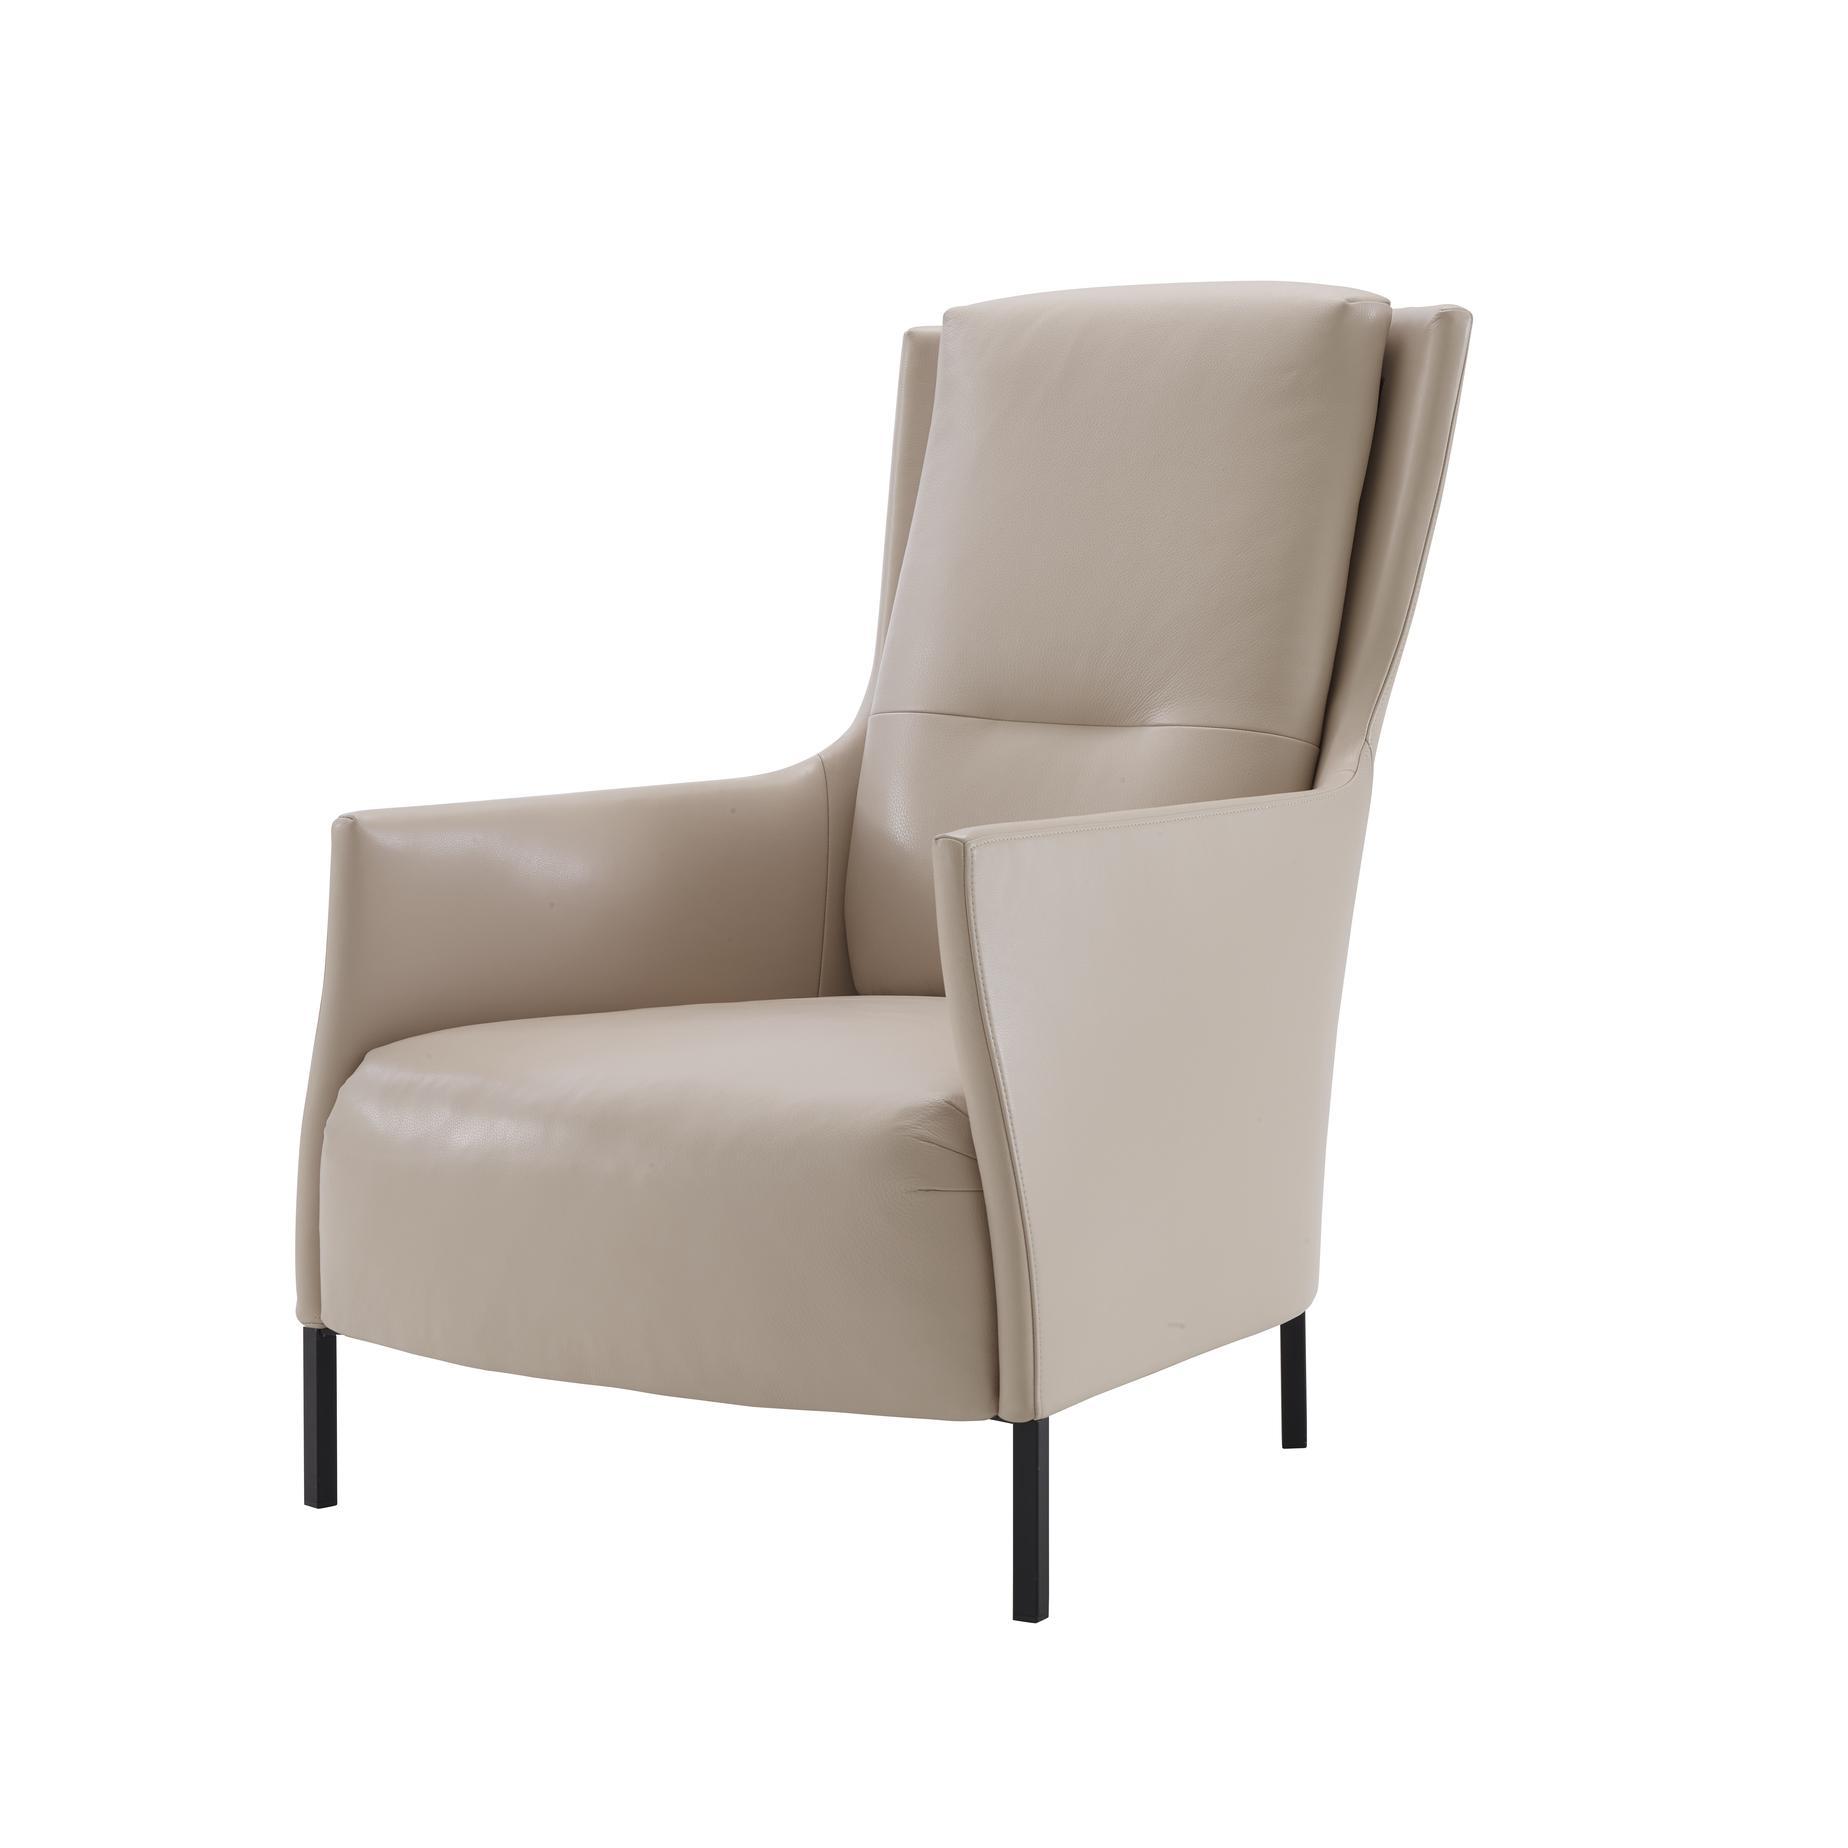 riga sessel designer eric jourdan ligne roset. Black Bedroom Furniture Sets. Home Design Ideas